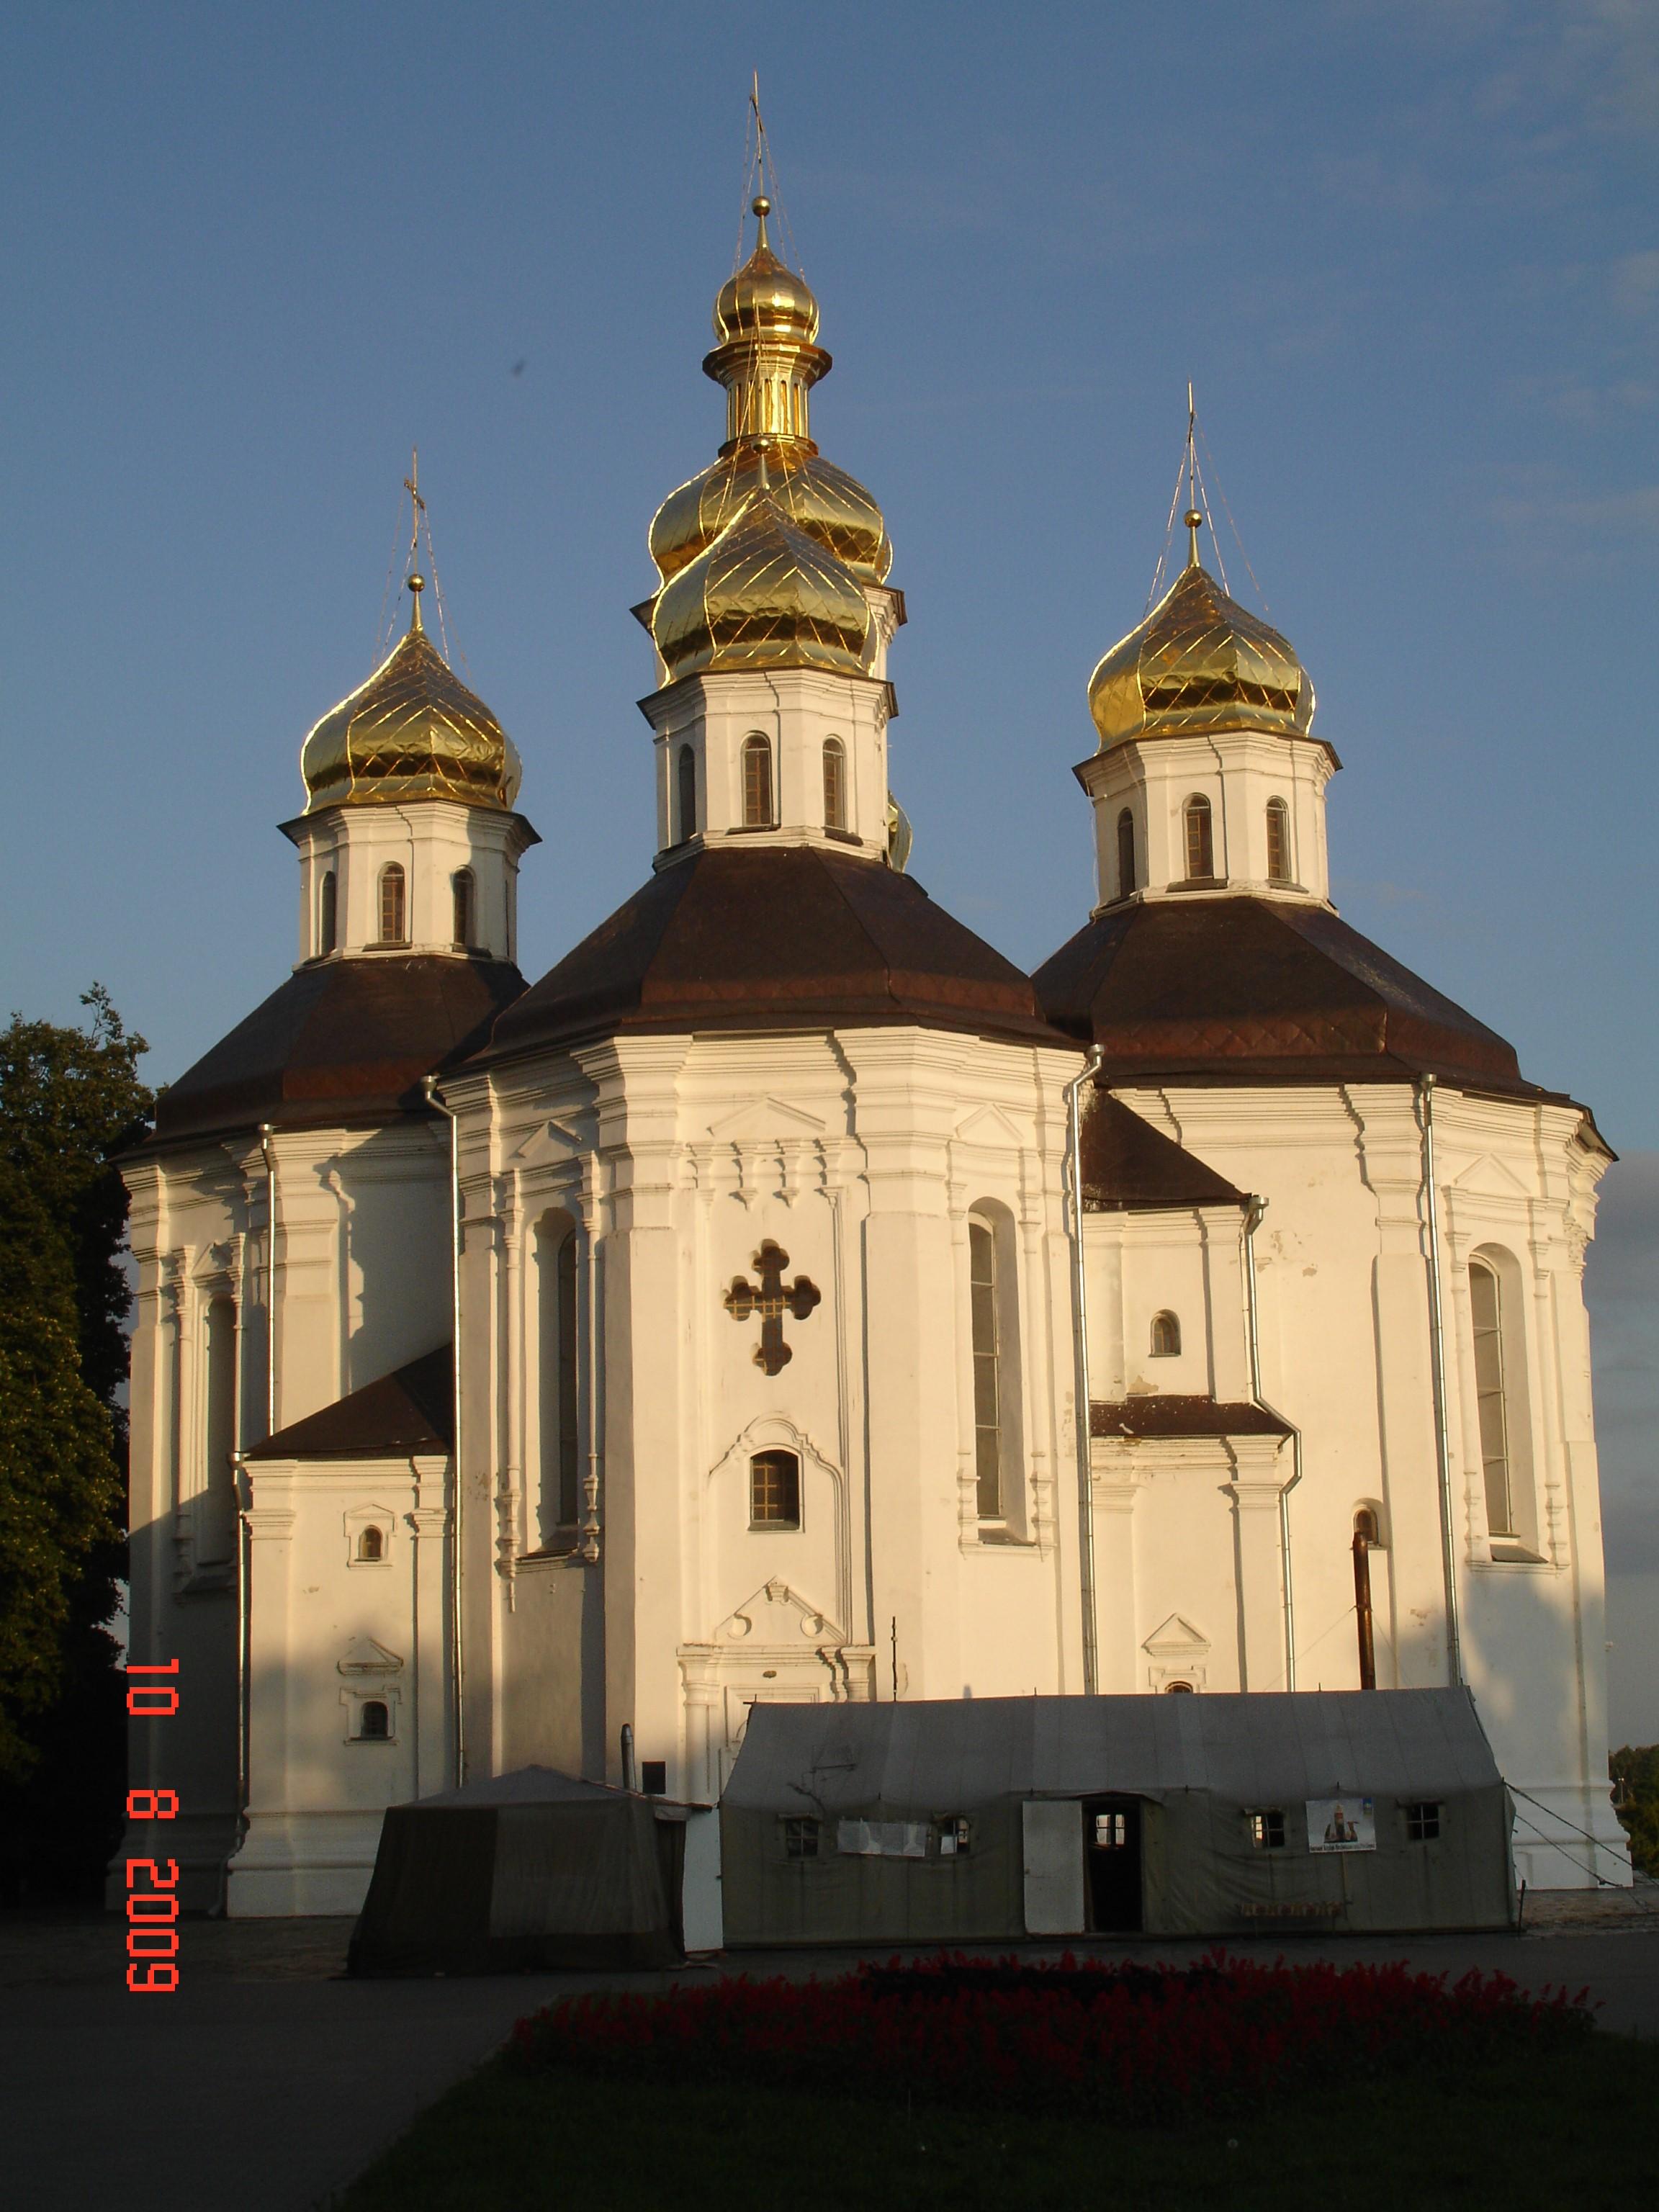 Чернігів. Катерининська церква (1715): newssky.com.ua